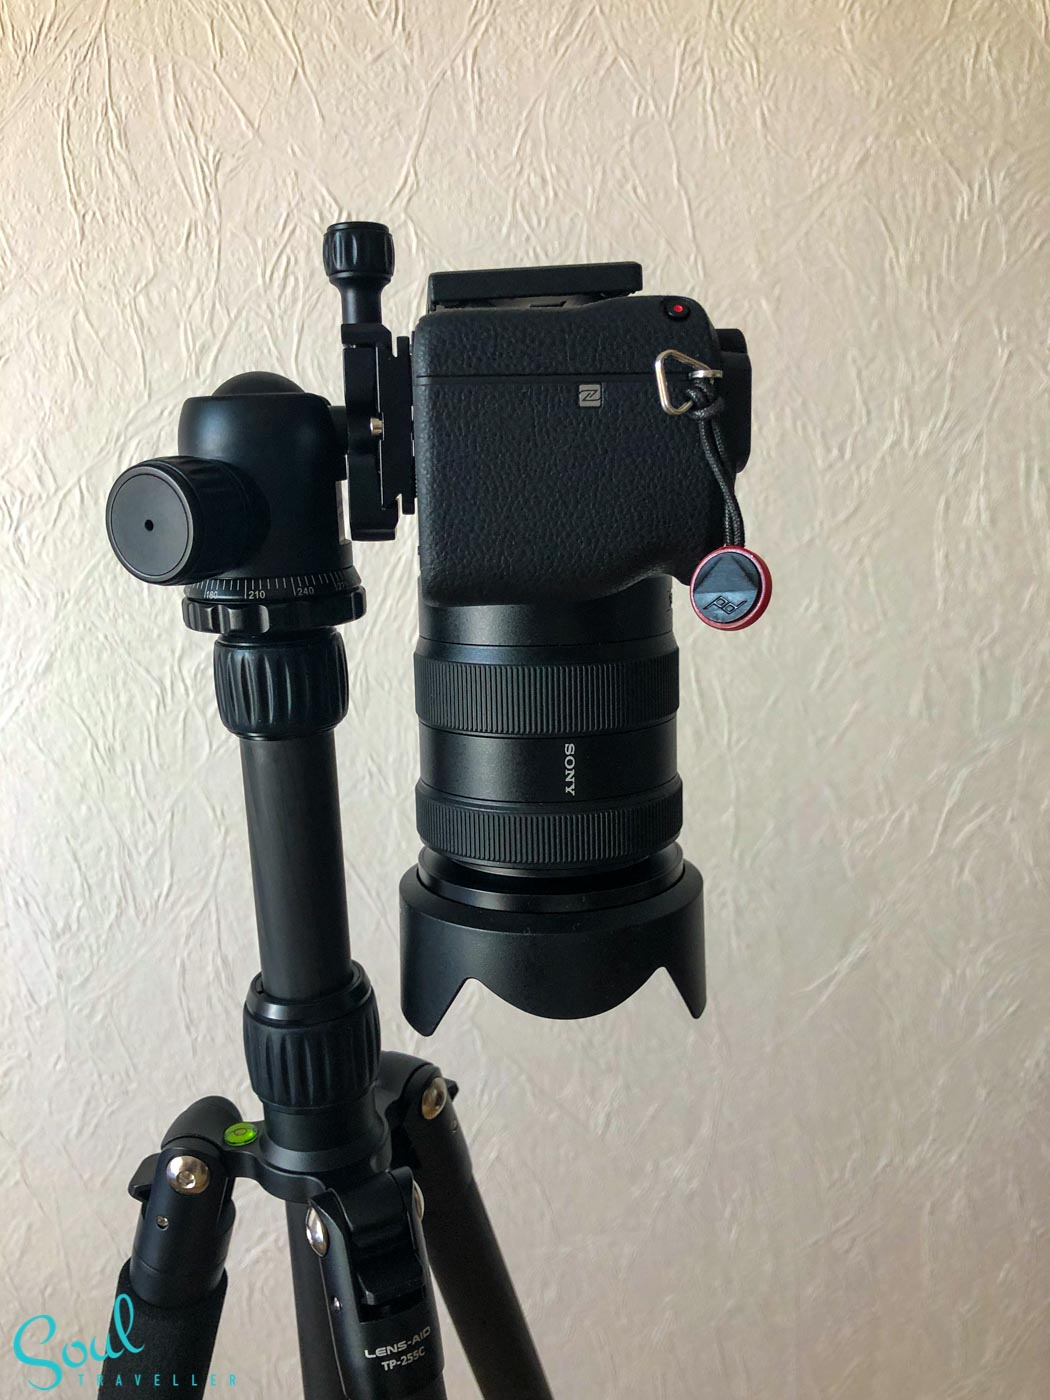 soul-traveller-reisestativ-lens-aid-carbon-stativ-test-023